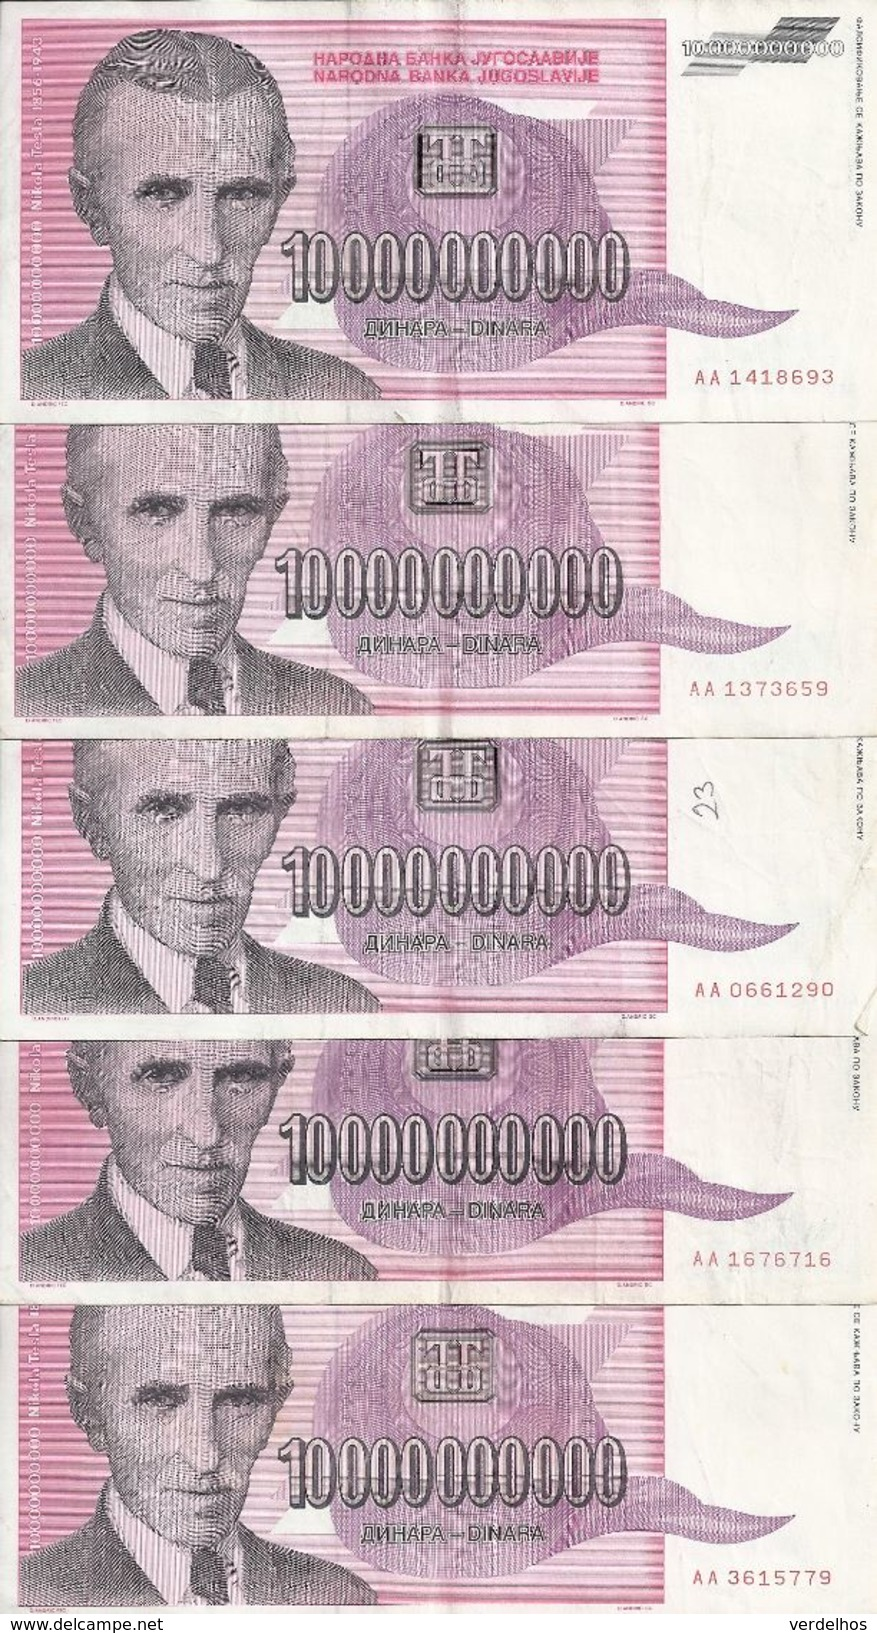 YOUGOSLAVIE 10 MILLIARD DINARA 1993 VF P 127 ( 5 Billets ) - Yougoslavie